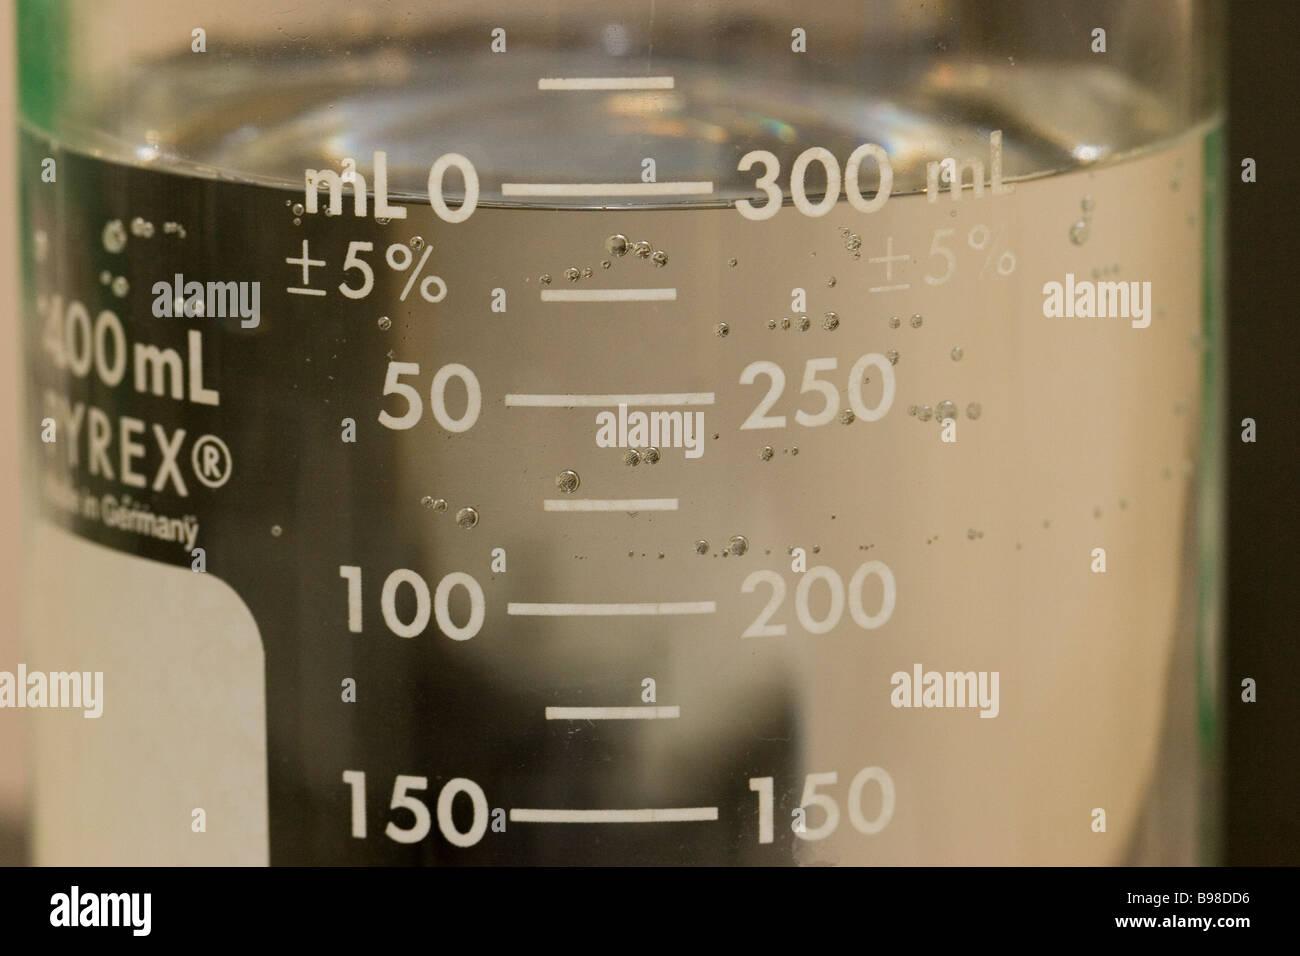 Laboratory beaker with clear liquid - Stock Image